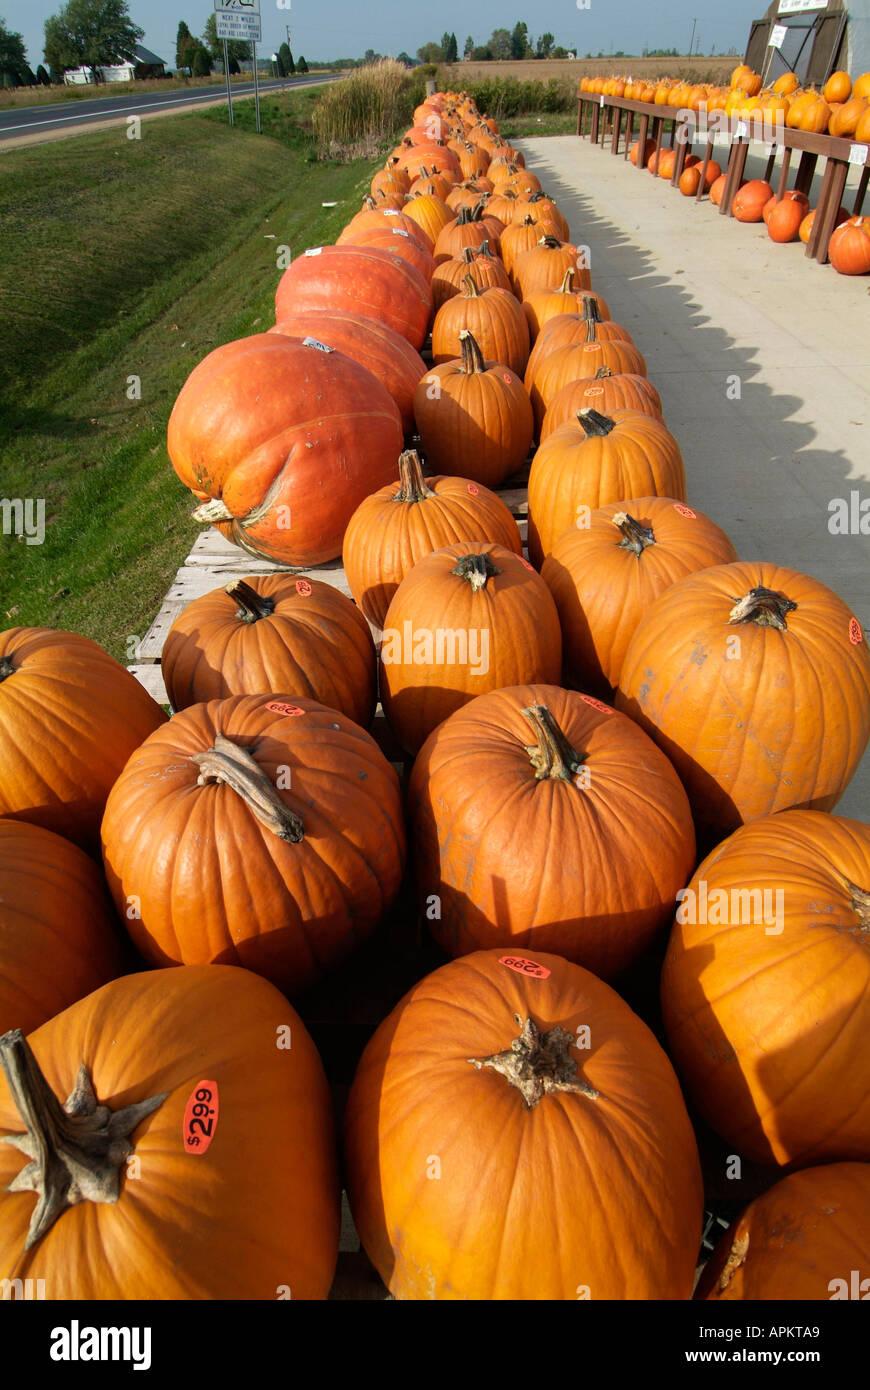 orange halloween pumpkins on display at a michigan farmers market